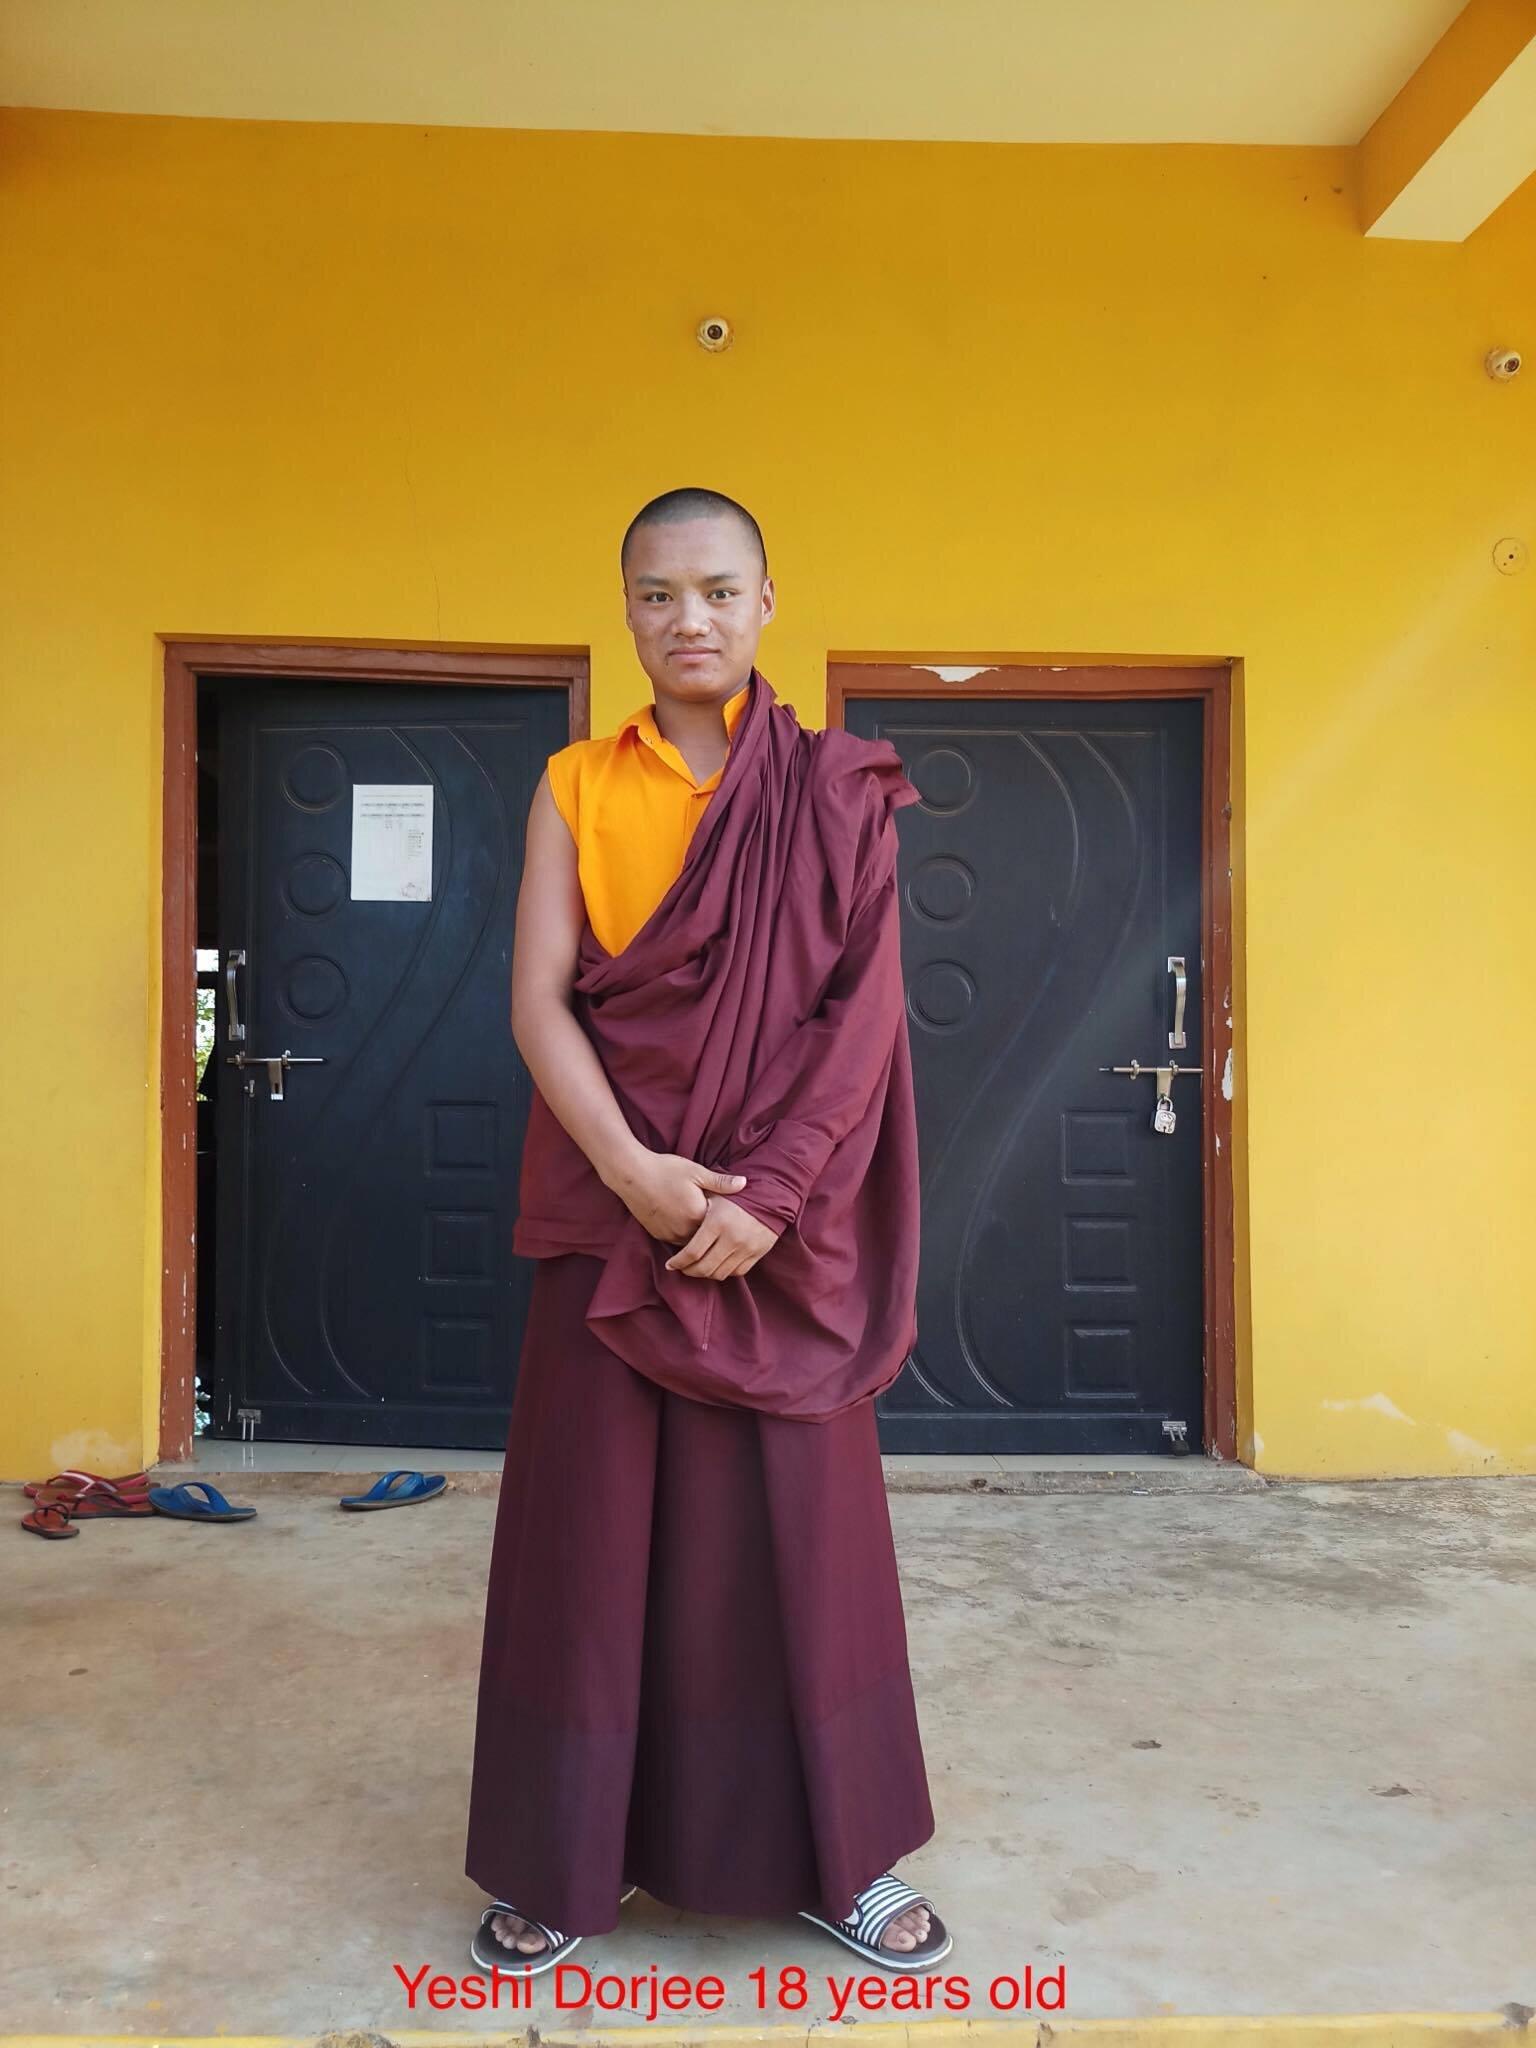 Monk_Yeshi_Dorjee_18yrs_old.jpg